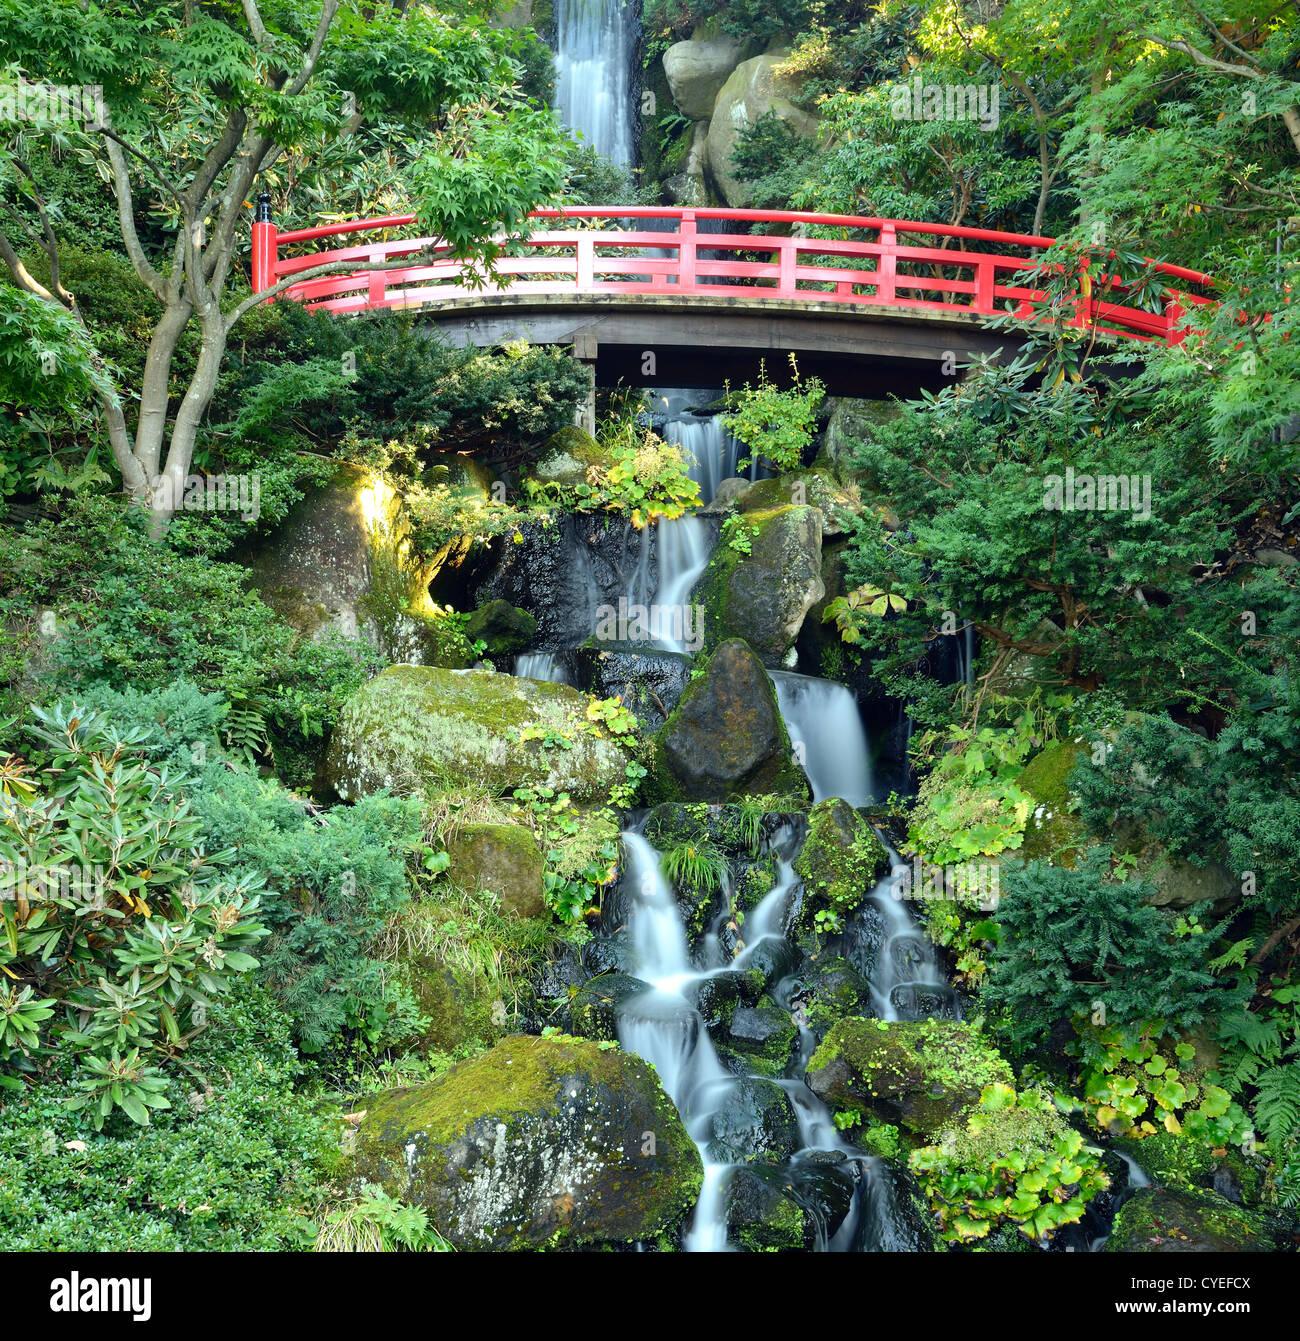 Cascada escénicos japoneses en Hirosaki, Japón. Imagen De Stock